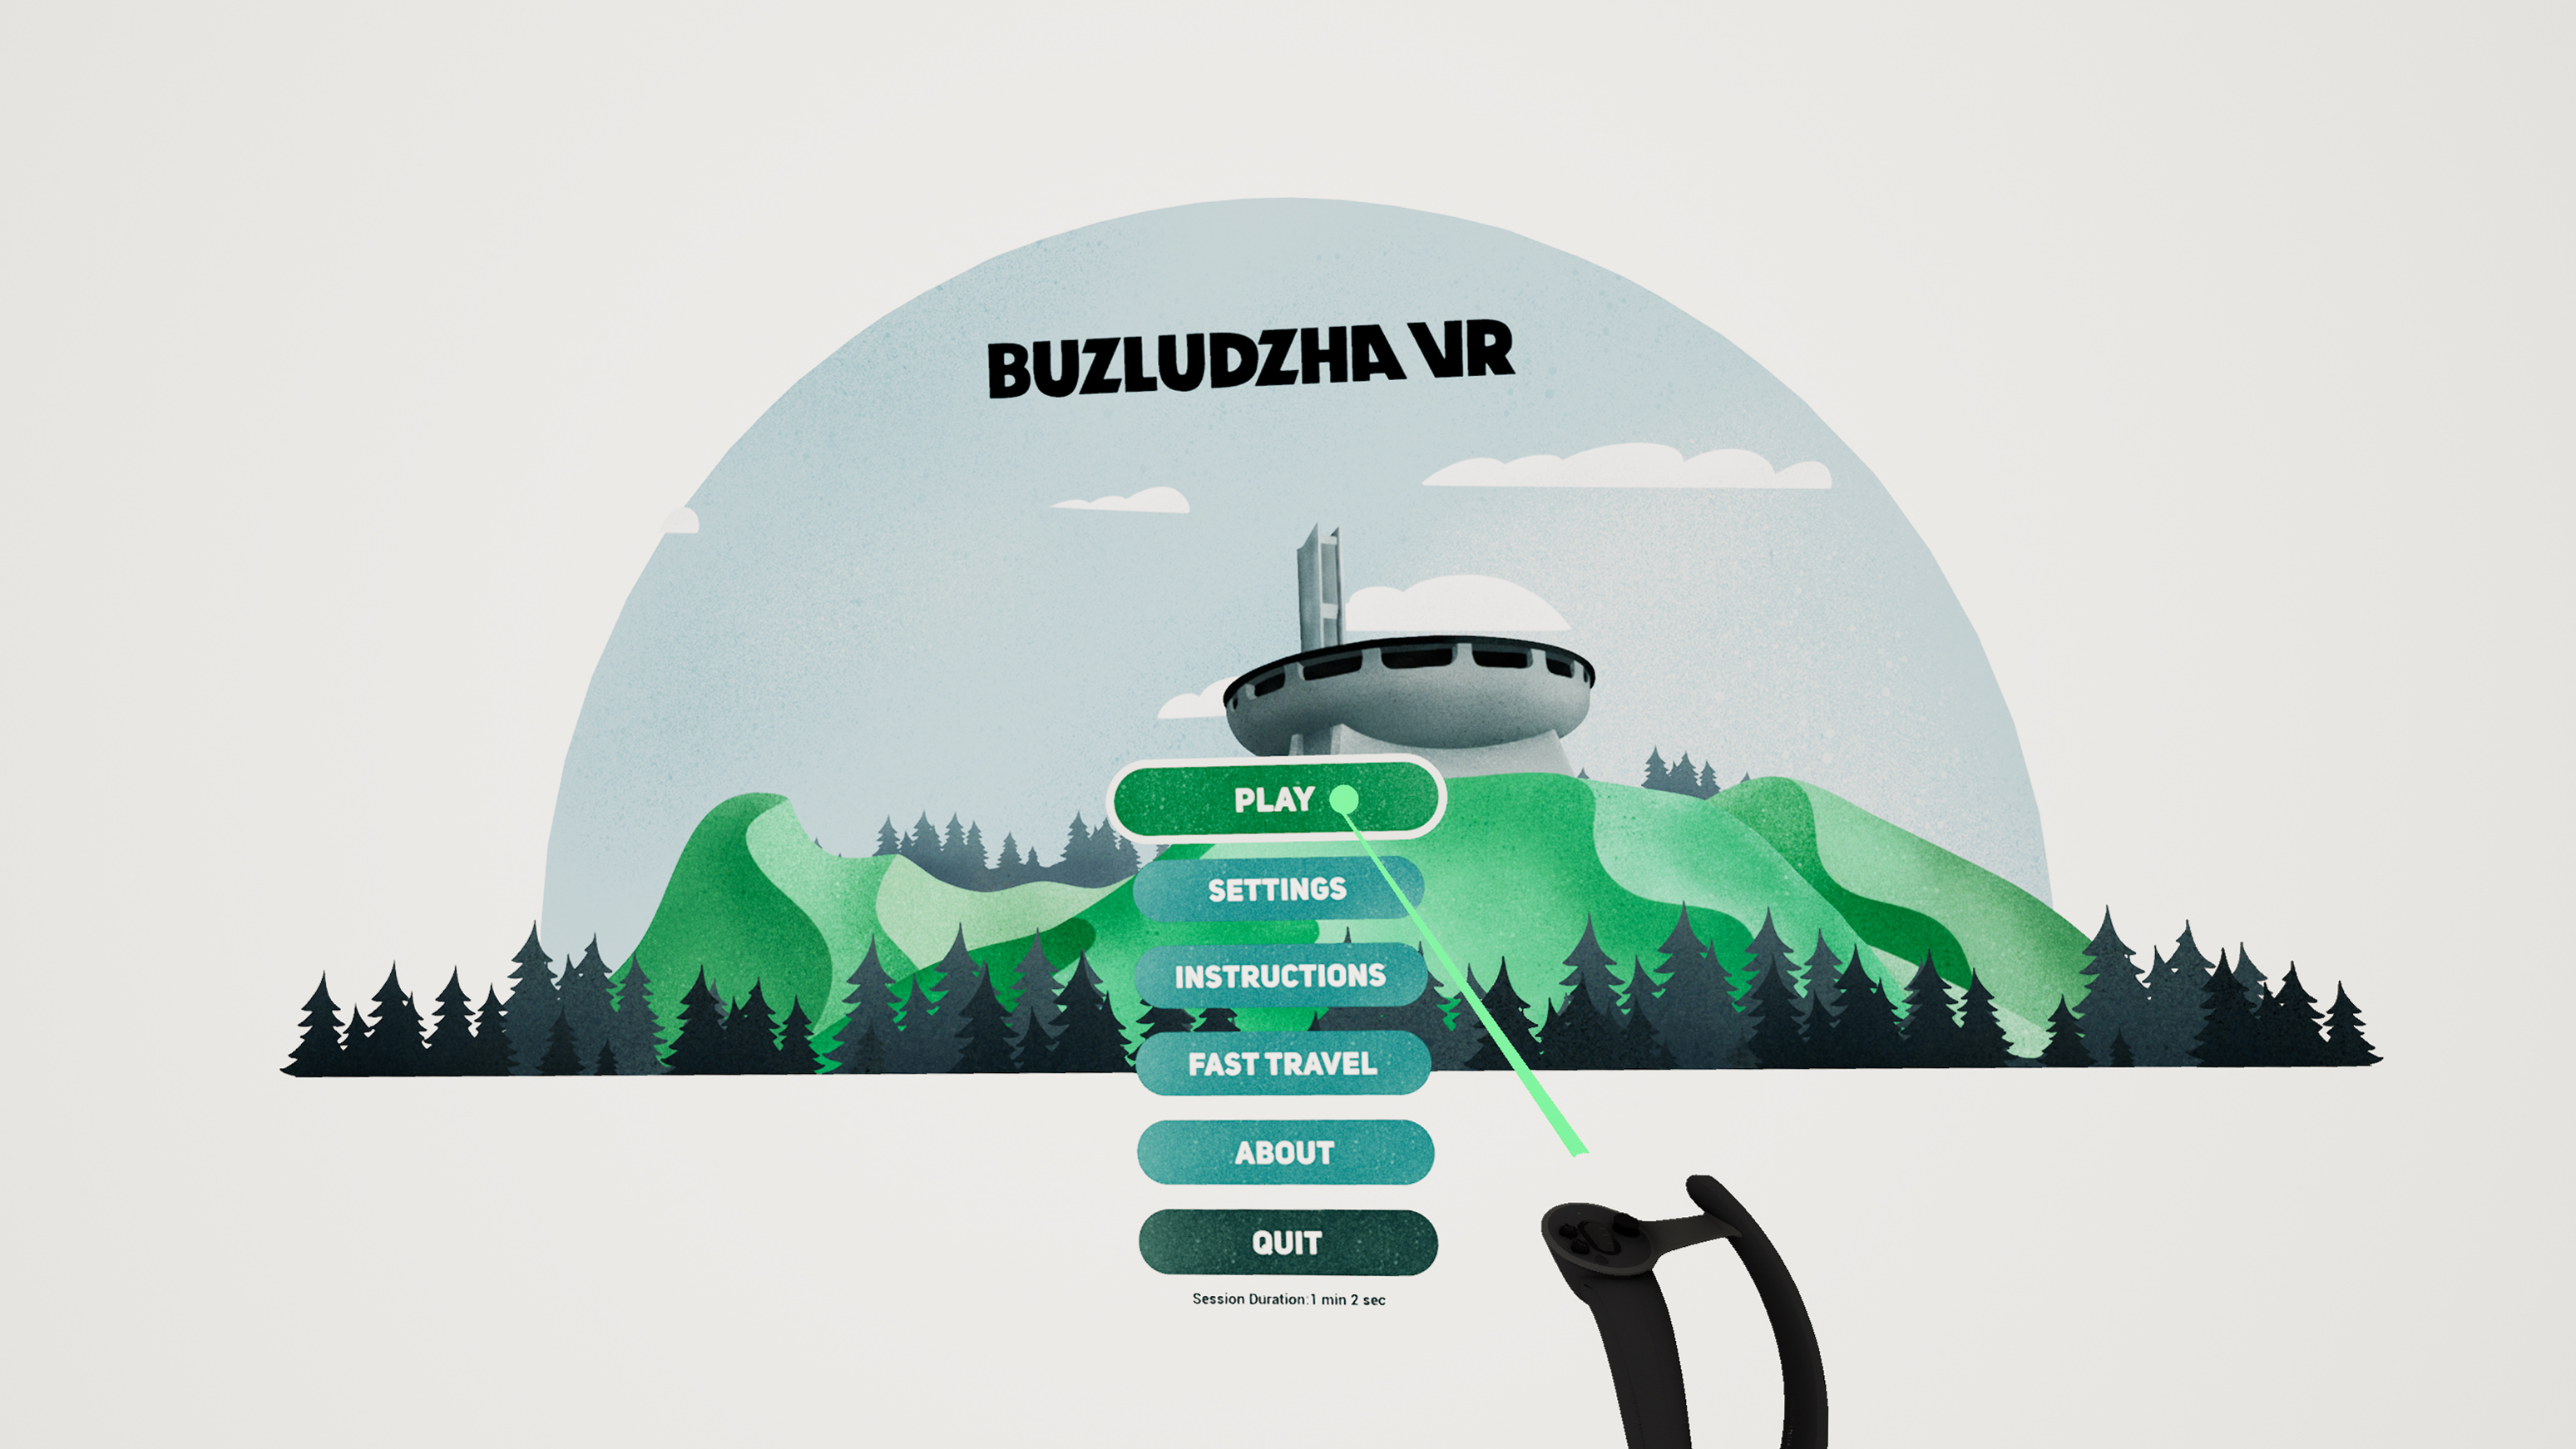 Buzludzha VR Exterior Front View